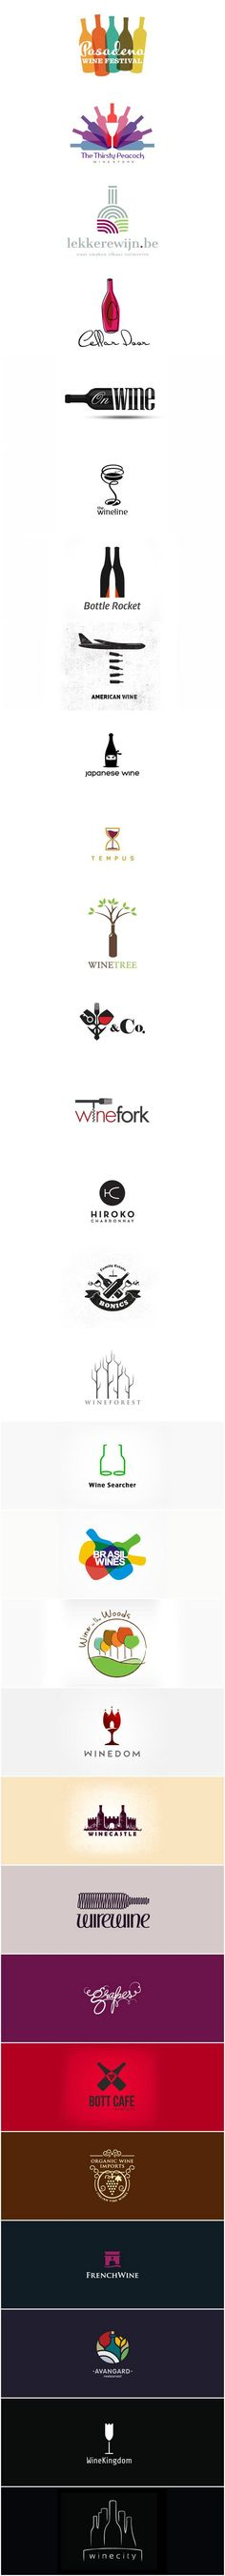 logos of wine #logo #wine